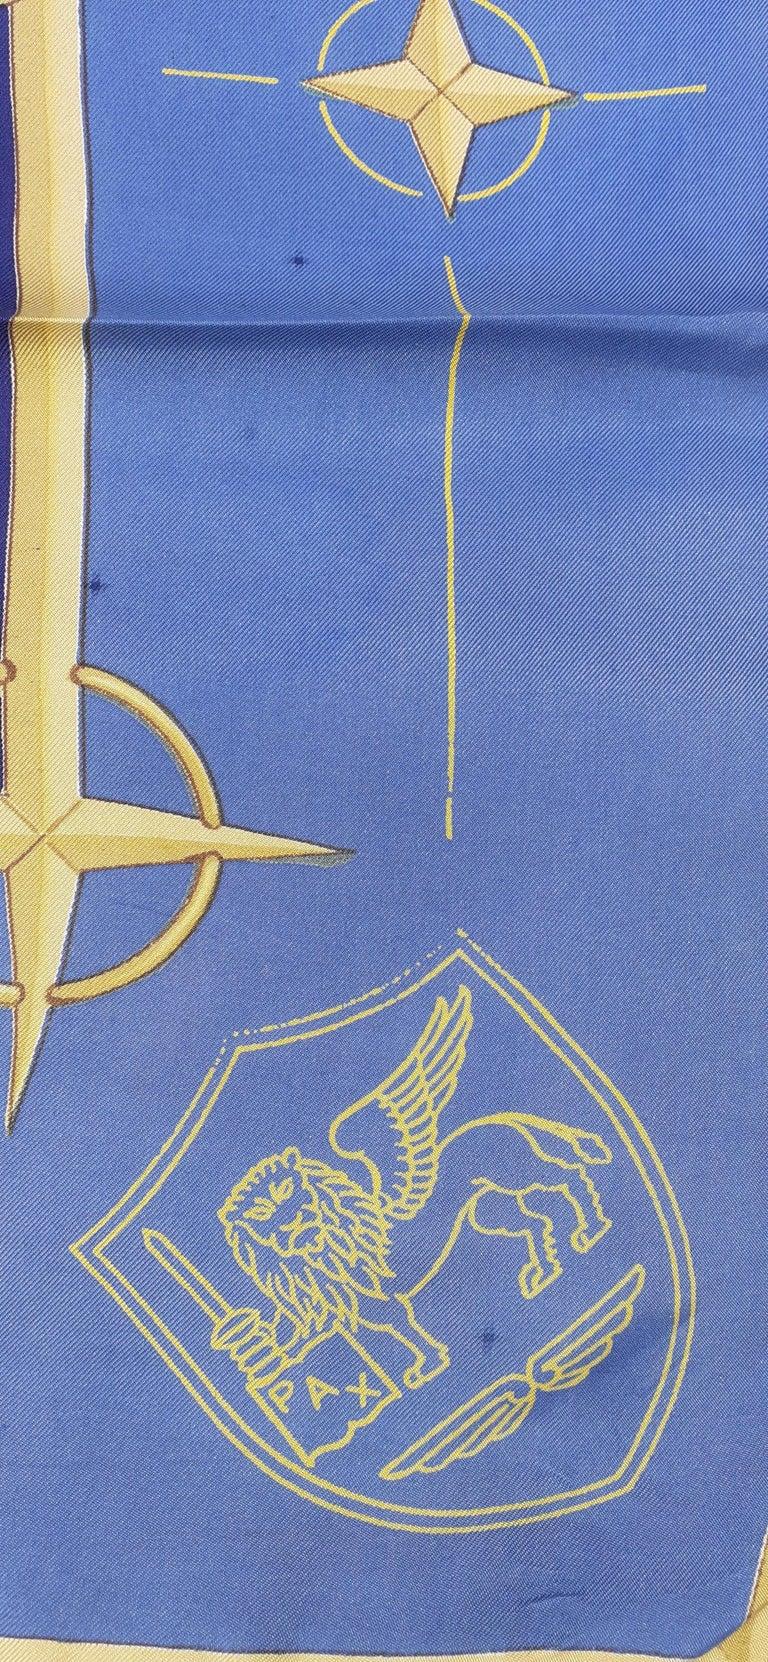 Exceptional Hermès Vintage Silk Scarf OTAN NATO Hugo Grygkar 1956 RARE For Sale 4